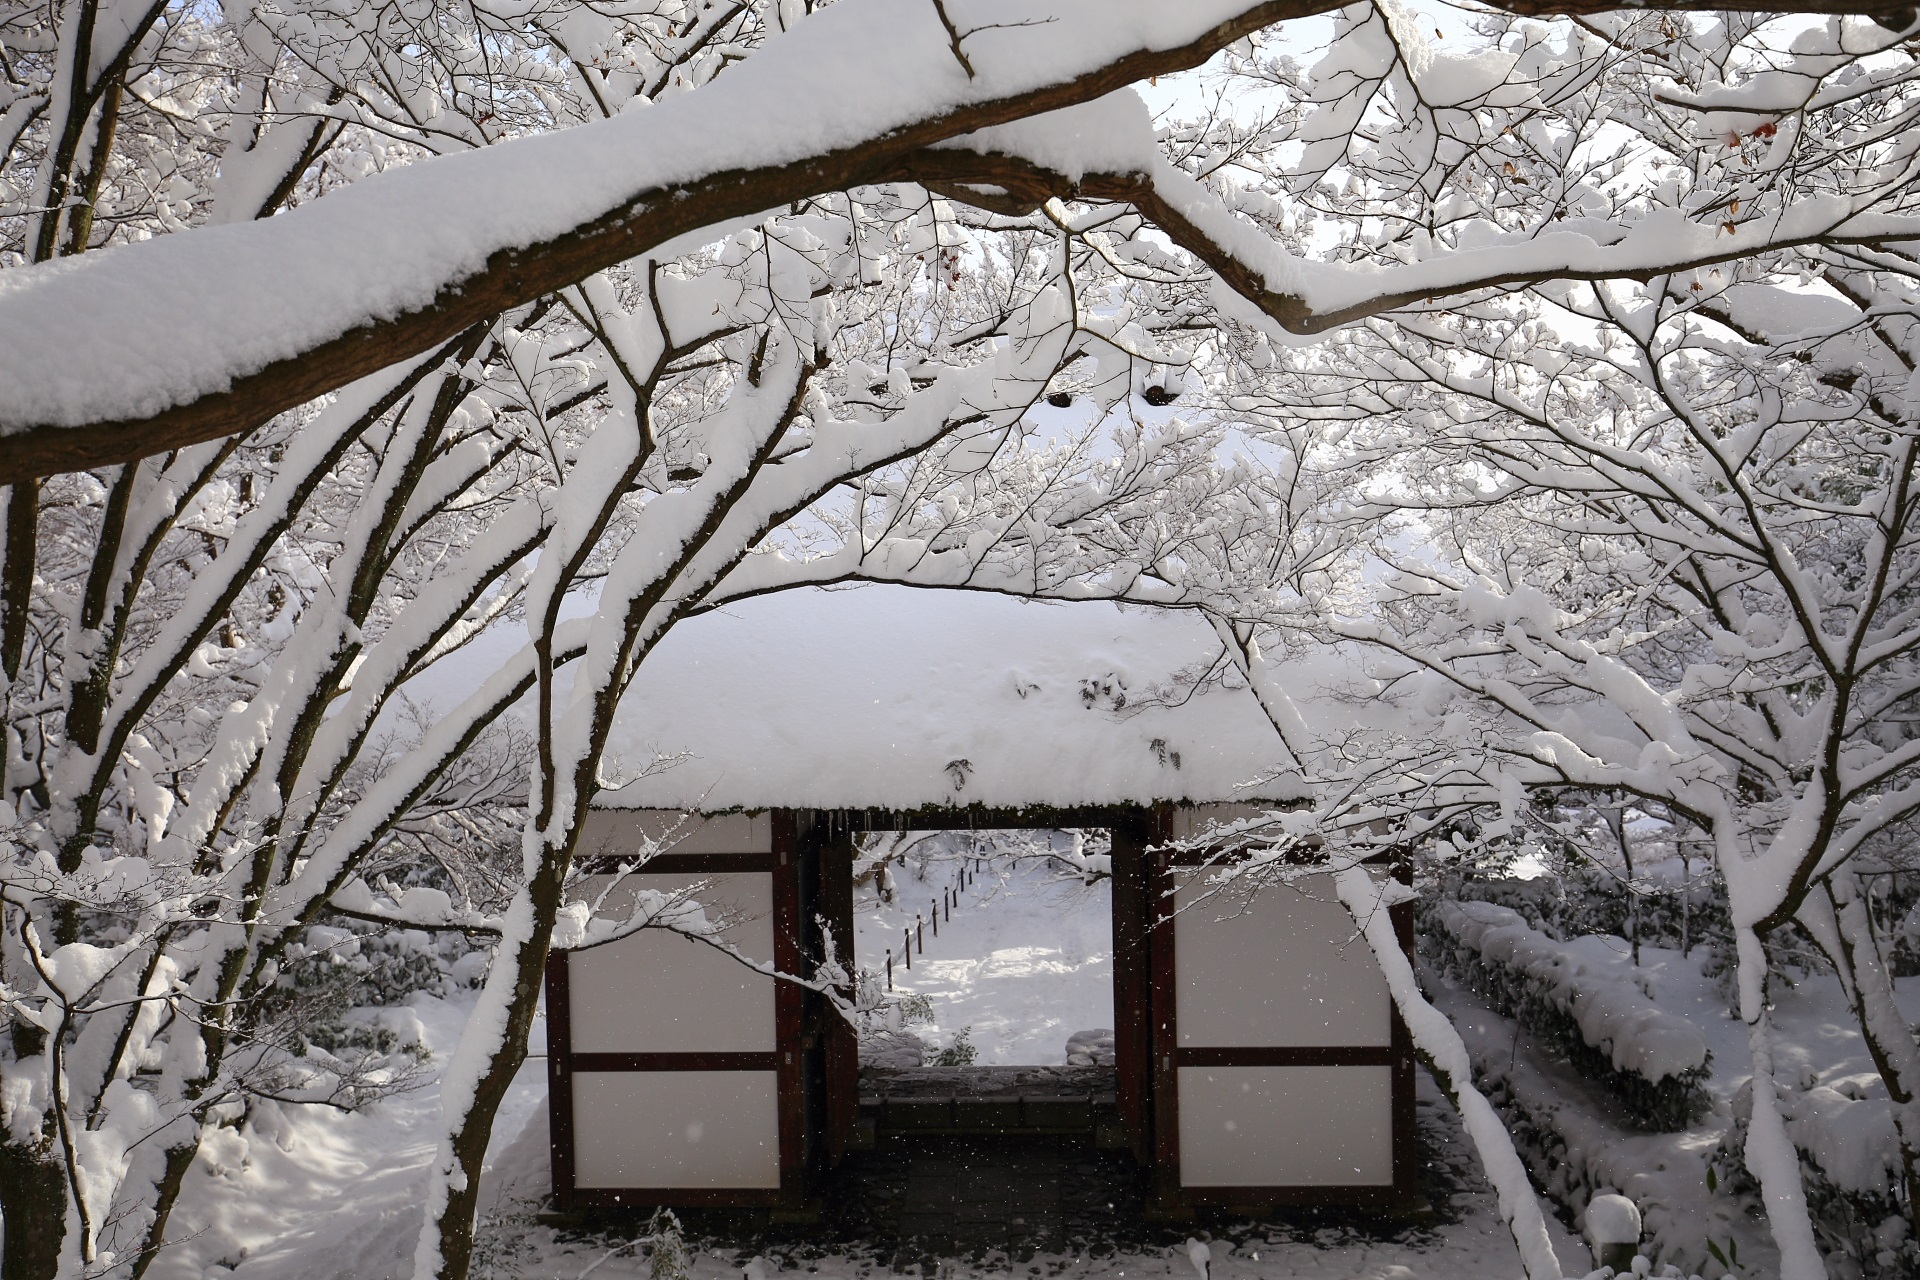 Kyoto Sagano Jyojyakko-ji Temple snowy landscape